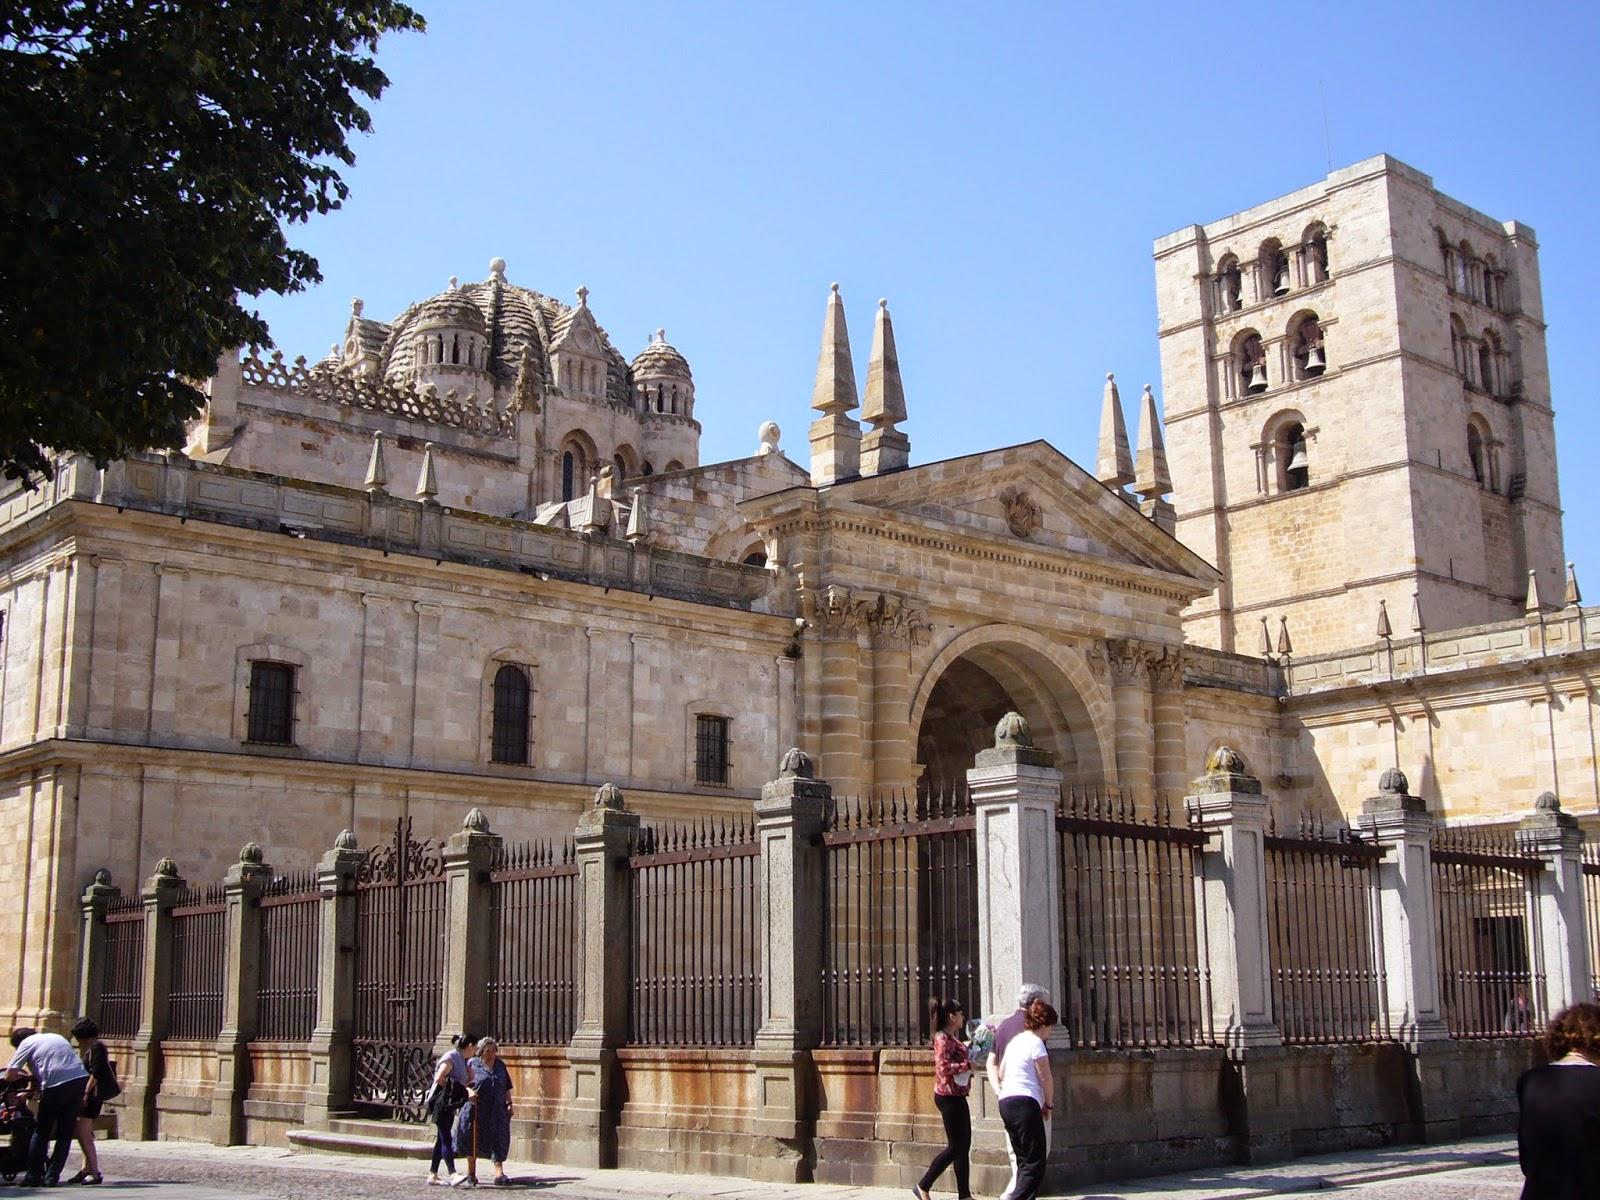 Ermitas medievales catedral del salvador zamora for Catedral de zamora interior